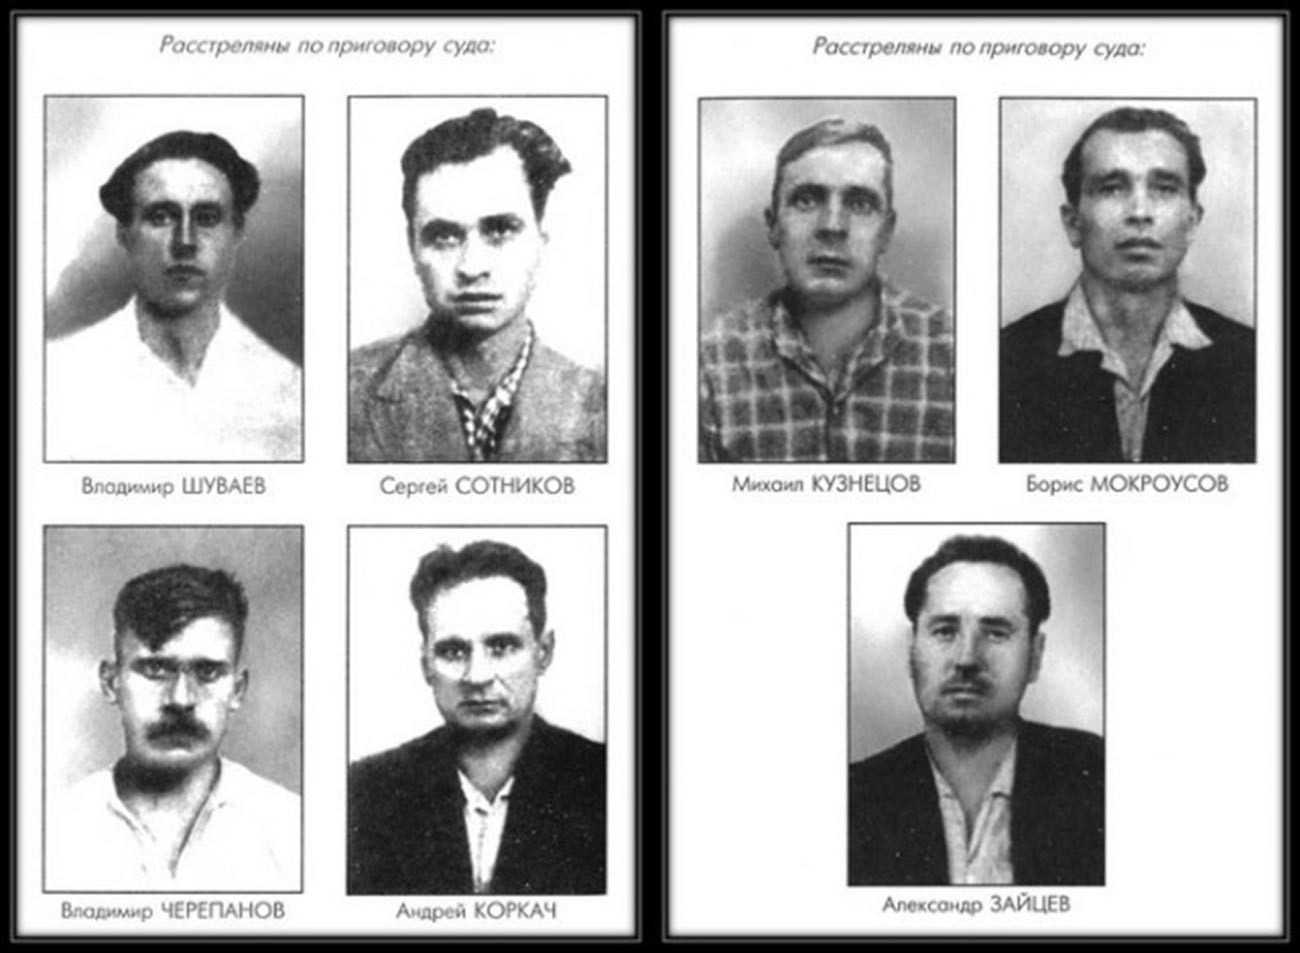 I sette lavoratori della fabbrica condannati a morte per fucilazione: Vladimir Shuvaev (1937-1962), Sergej Sotnikov (1937-1962), Mikhail Kuznetsov (1930-1962), Boris Mokrousov (1923-1962), Vladimir Cherepanov (1933-1962), Andrej Korkach (1917-1962), Aleksandr Zaytsev (1927-1962)